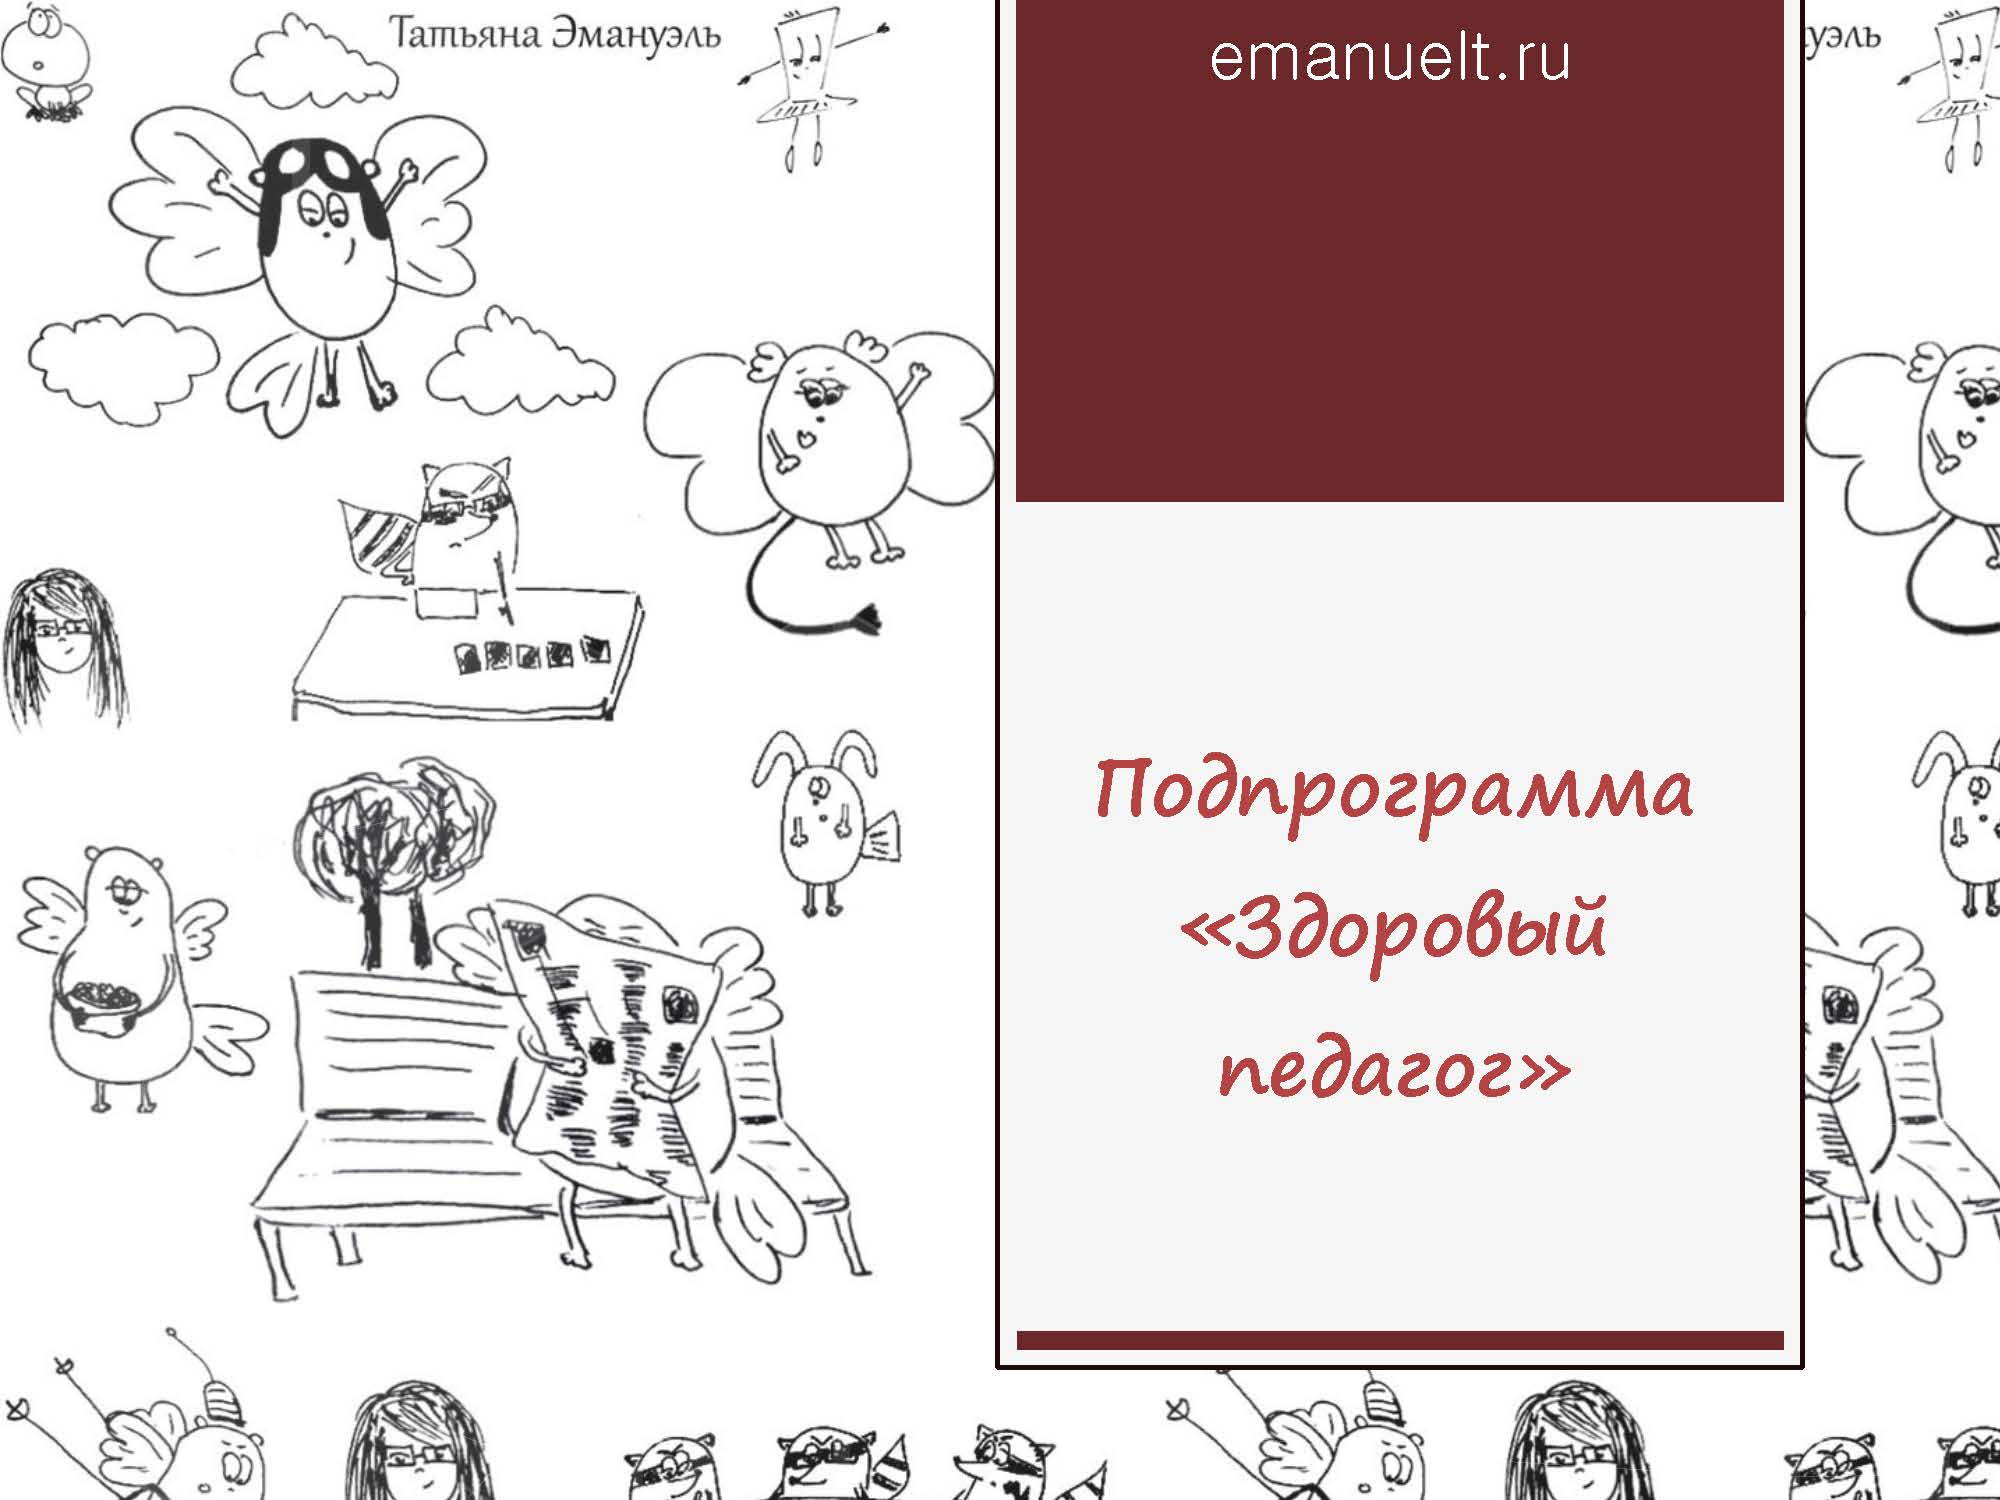 06 февраля эмануэль_Страница_059